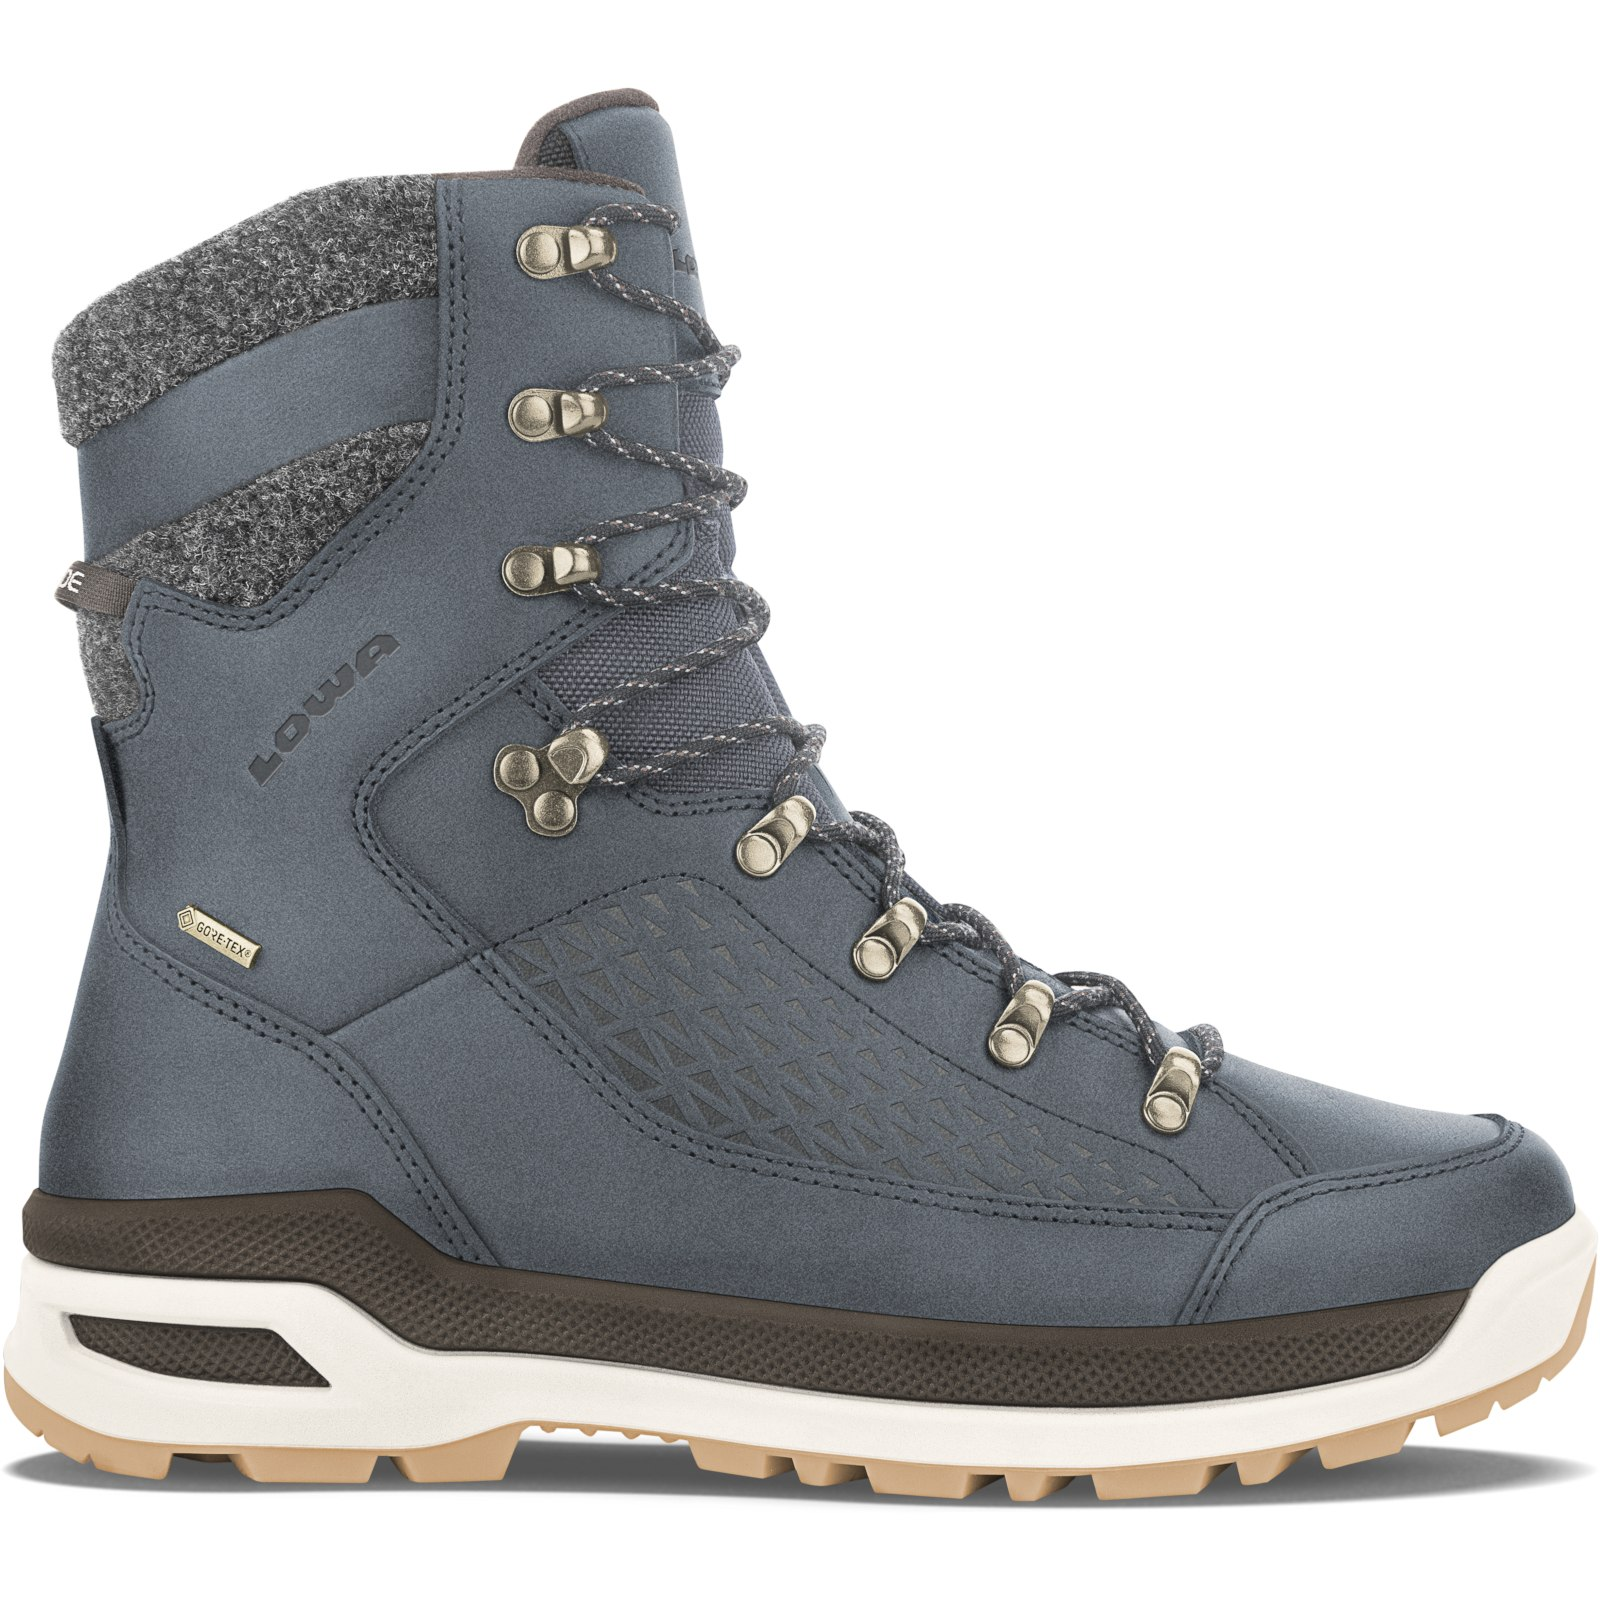 LOWA Renegade EVO Ice GTX Winter Shoe - navy/honey